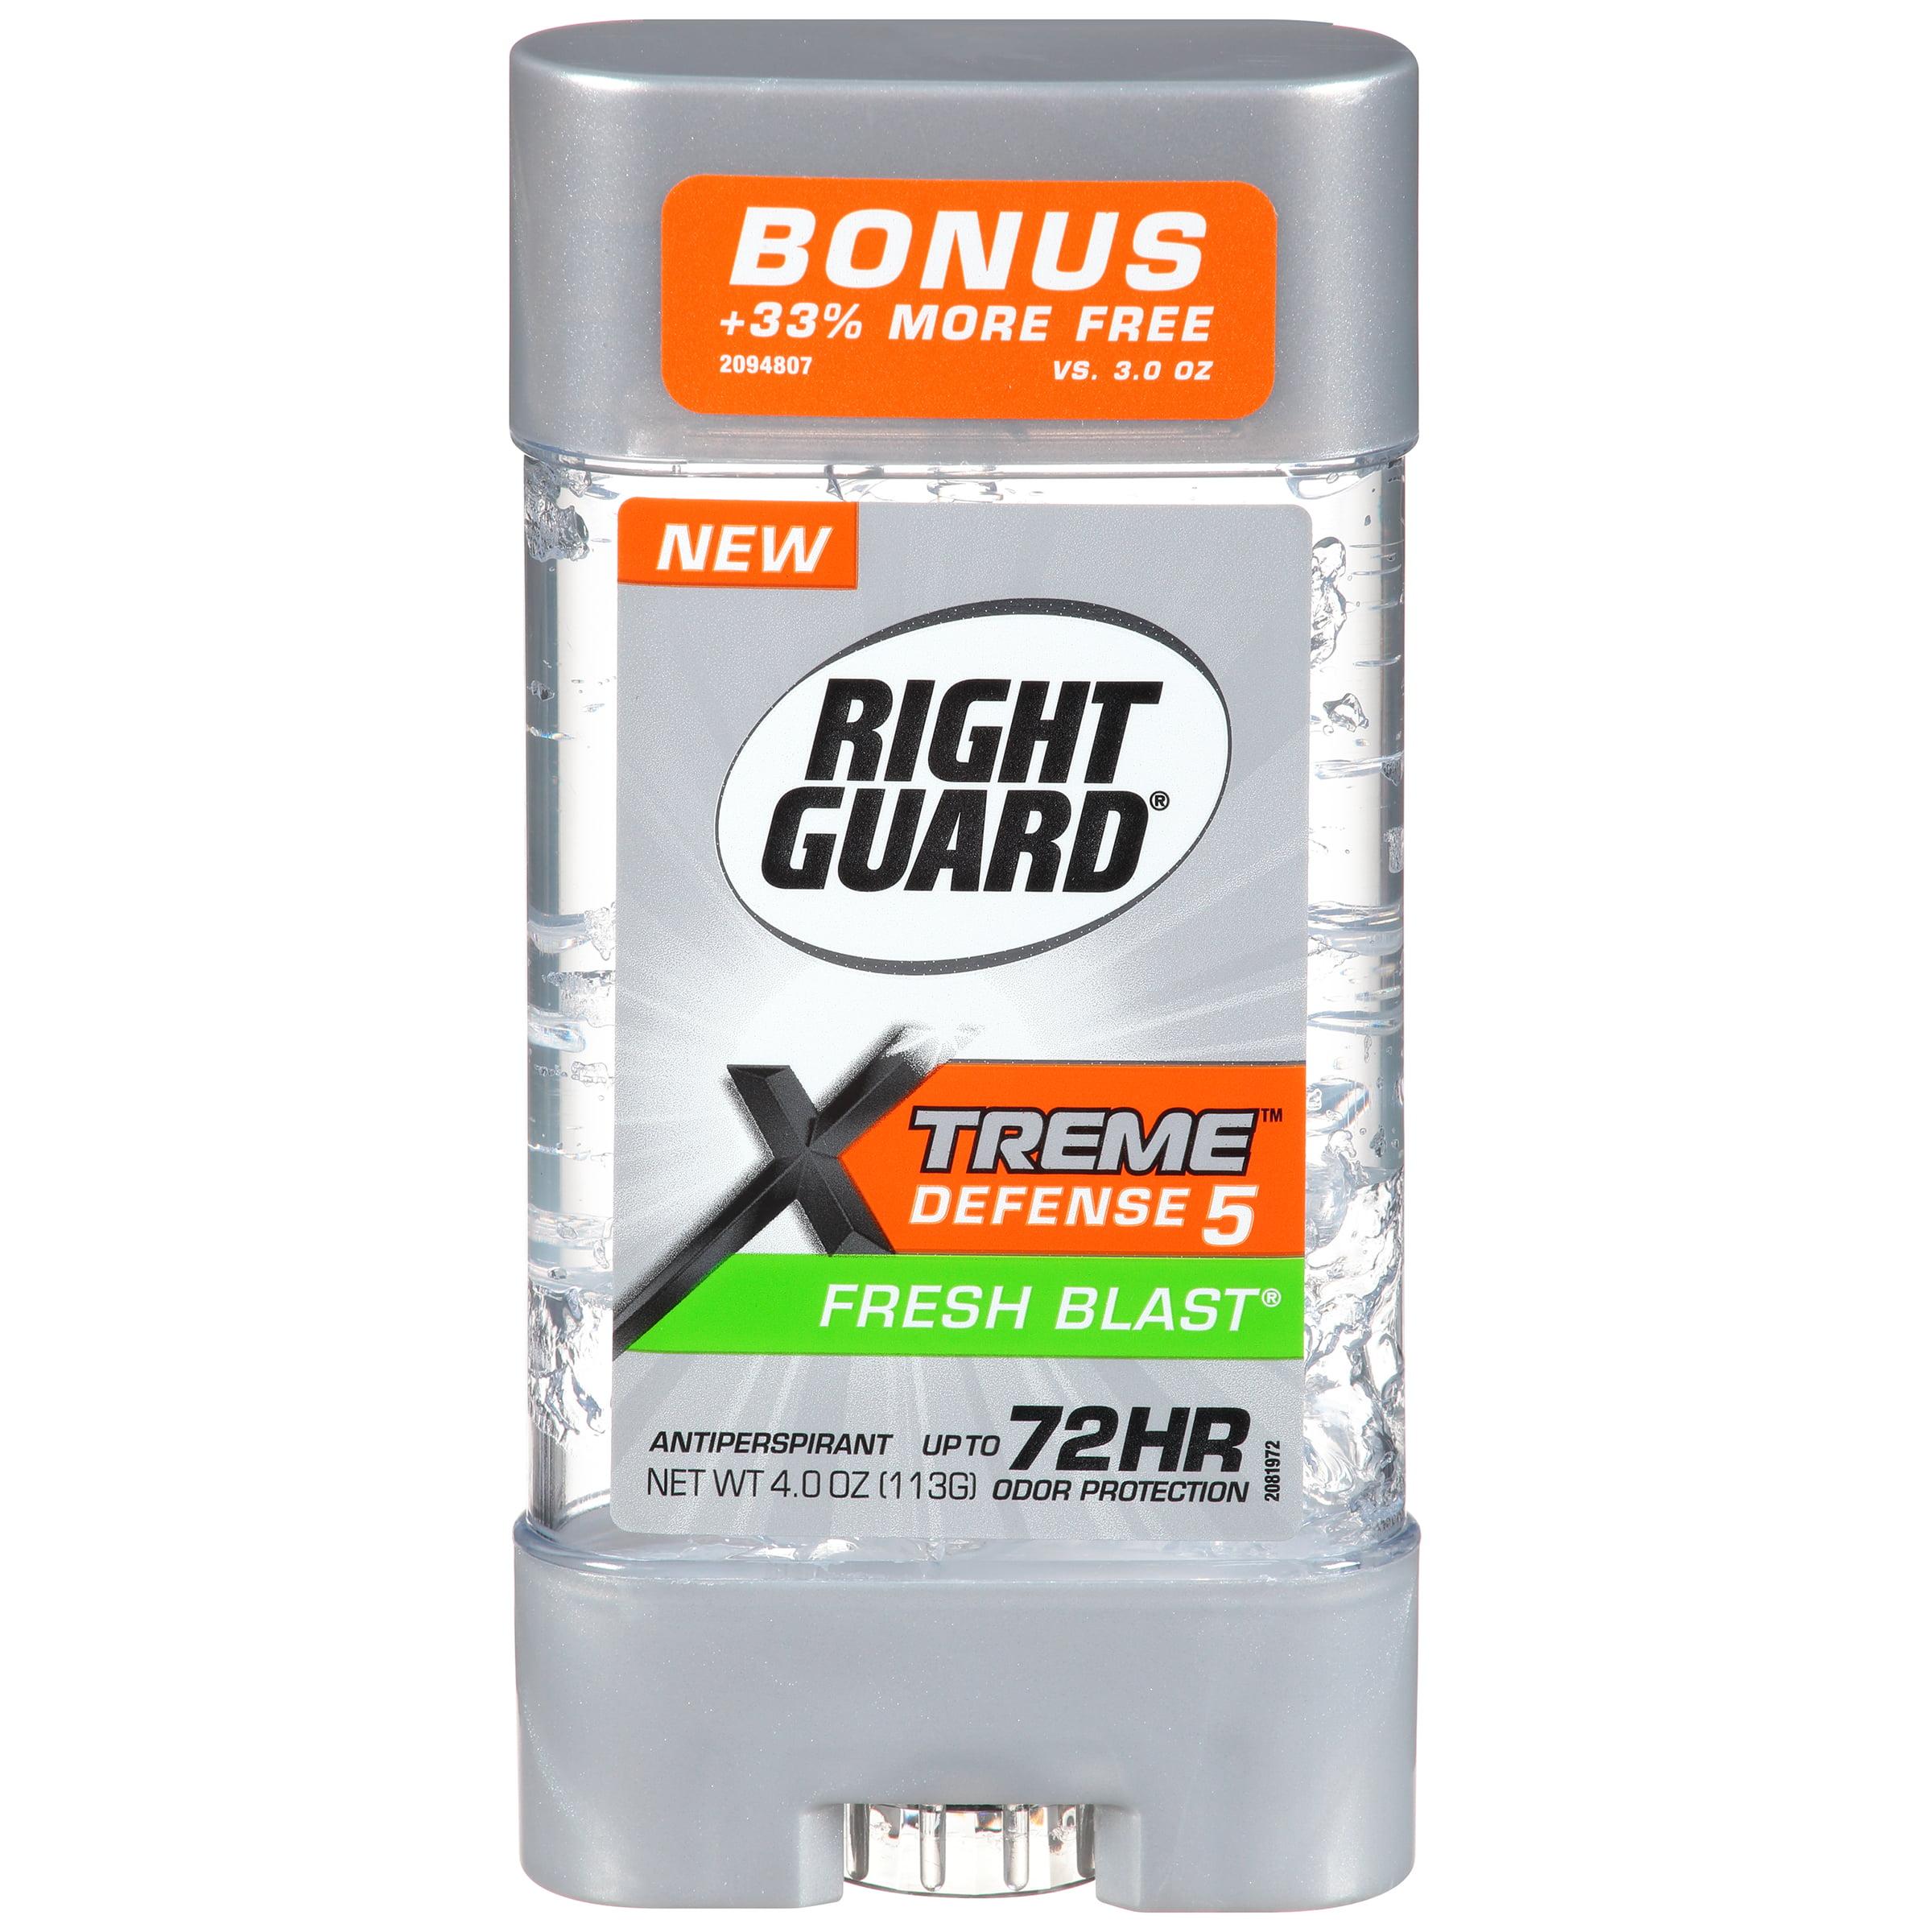 Right Guard Xtreme Defense 5 Antiperspirant Deodorant Gel, Fresh Blast, 4 Ounce